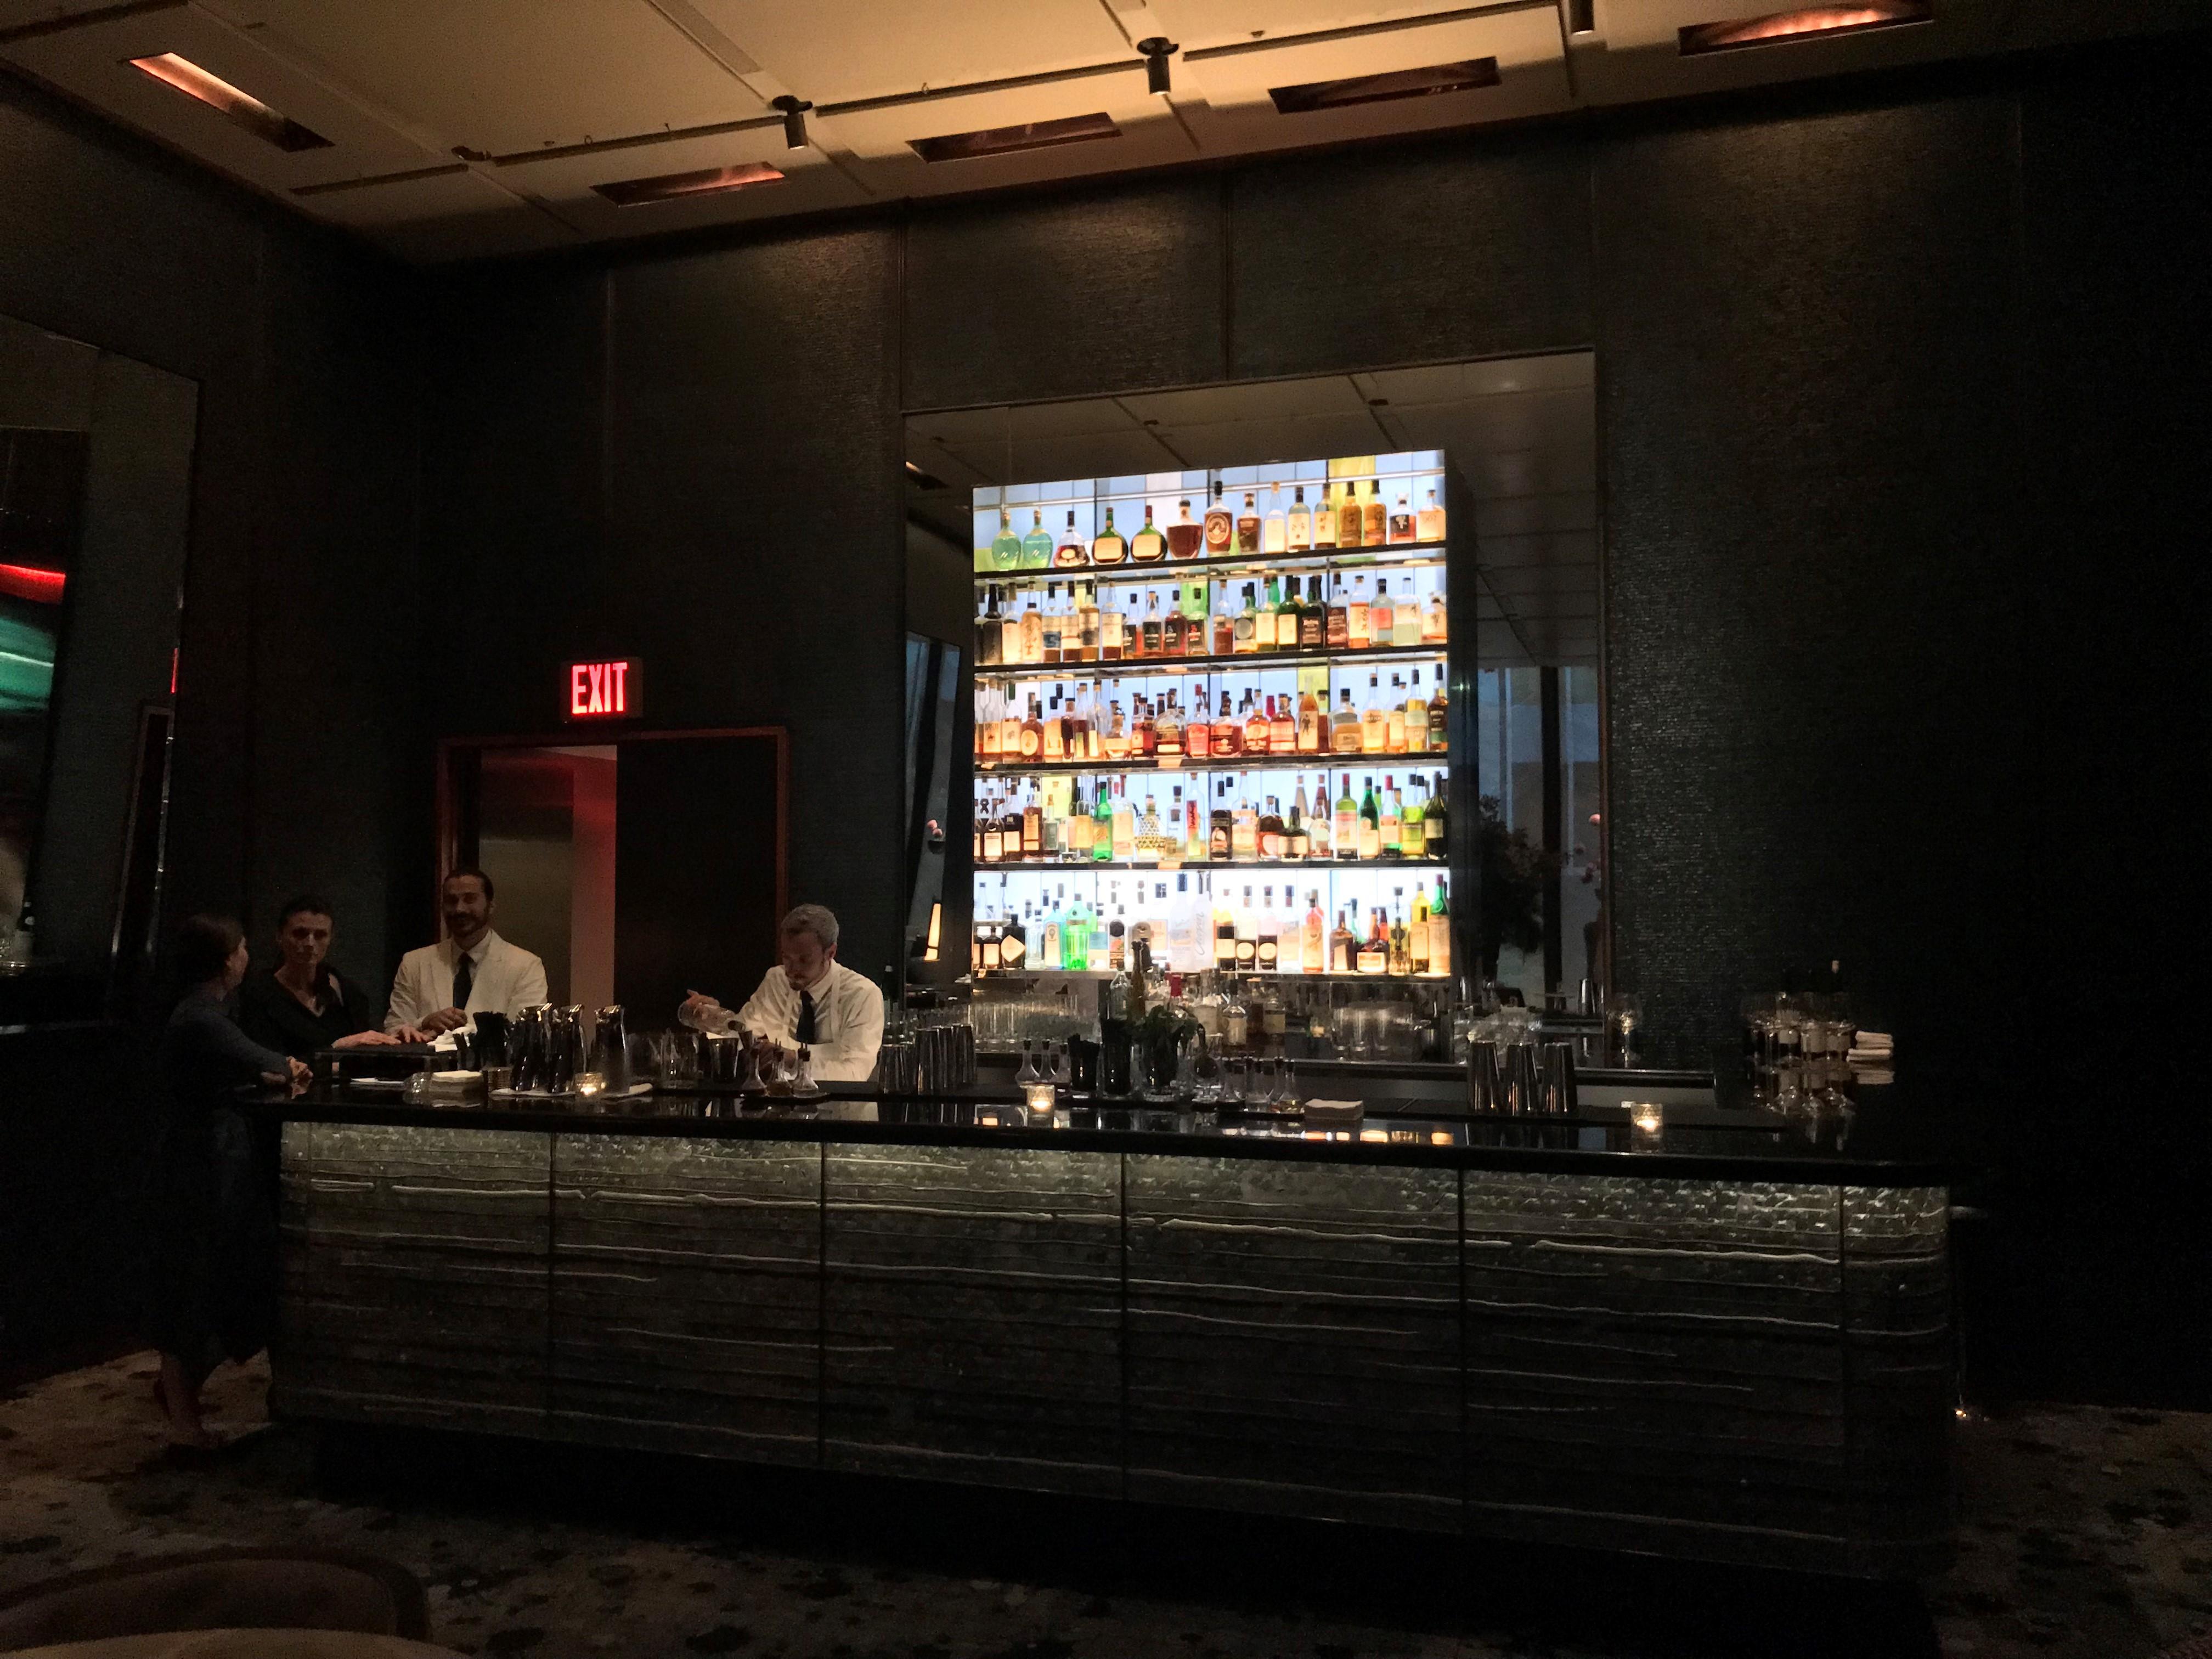 Classic Manhattan Restaurant The Grill The Pool Dazzles